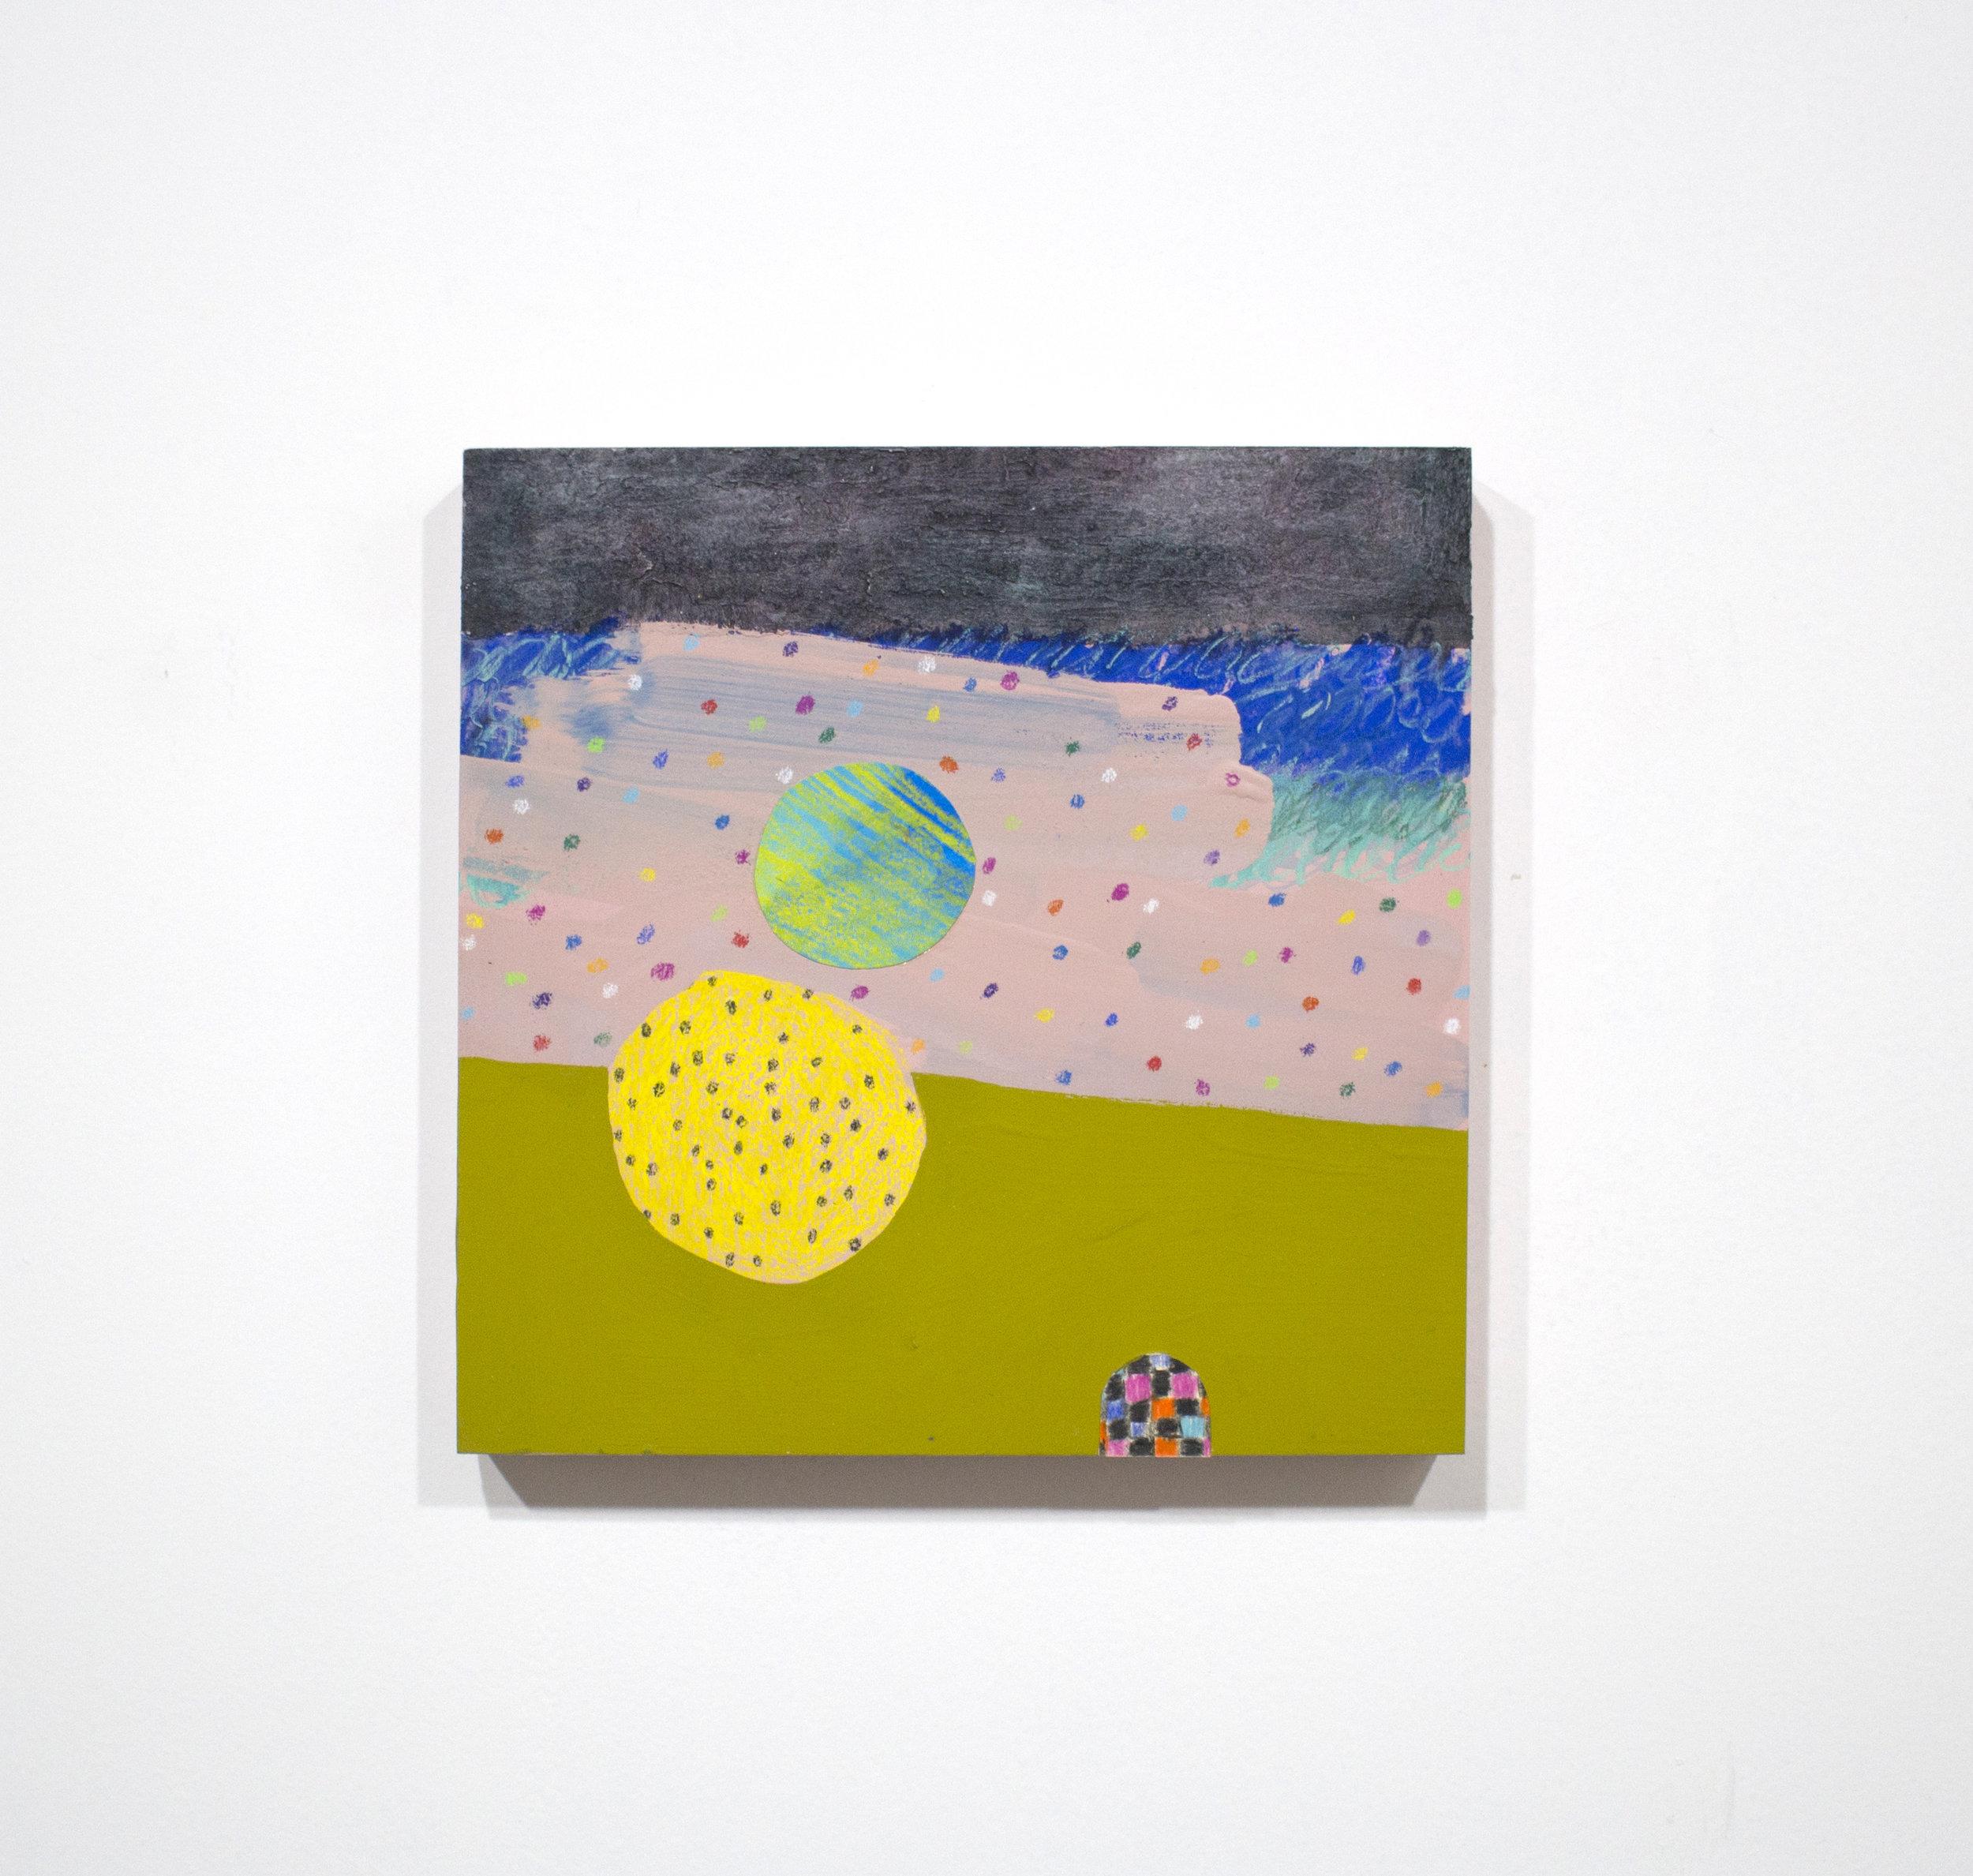 cookie tumble , 2016, tecnica mista su tavola, 25 x 25 cm